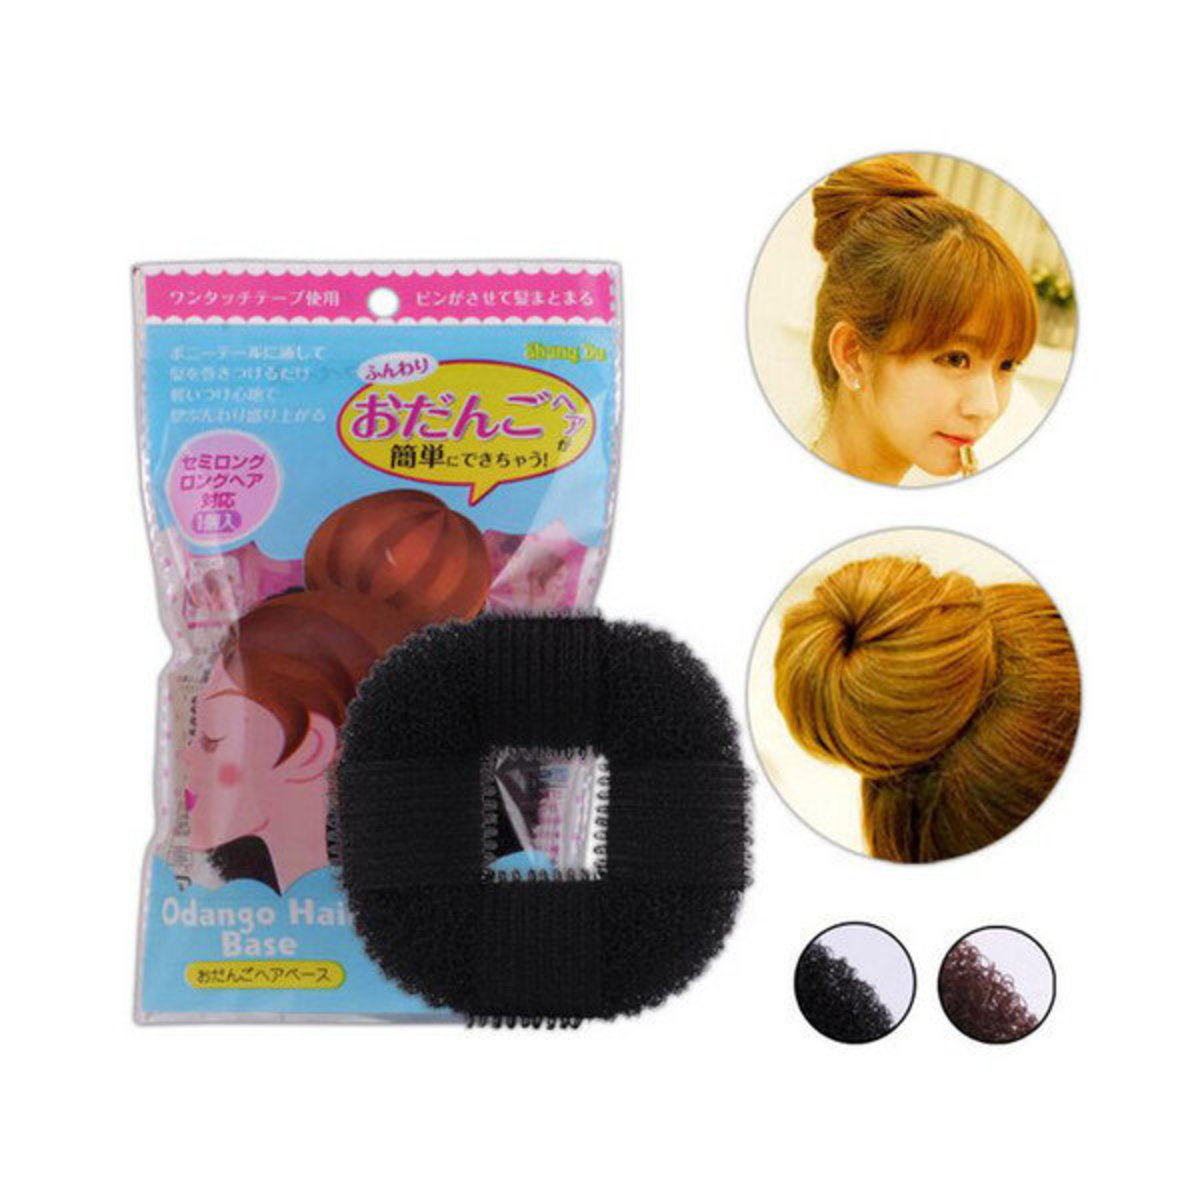 Odango Hair Base accessories